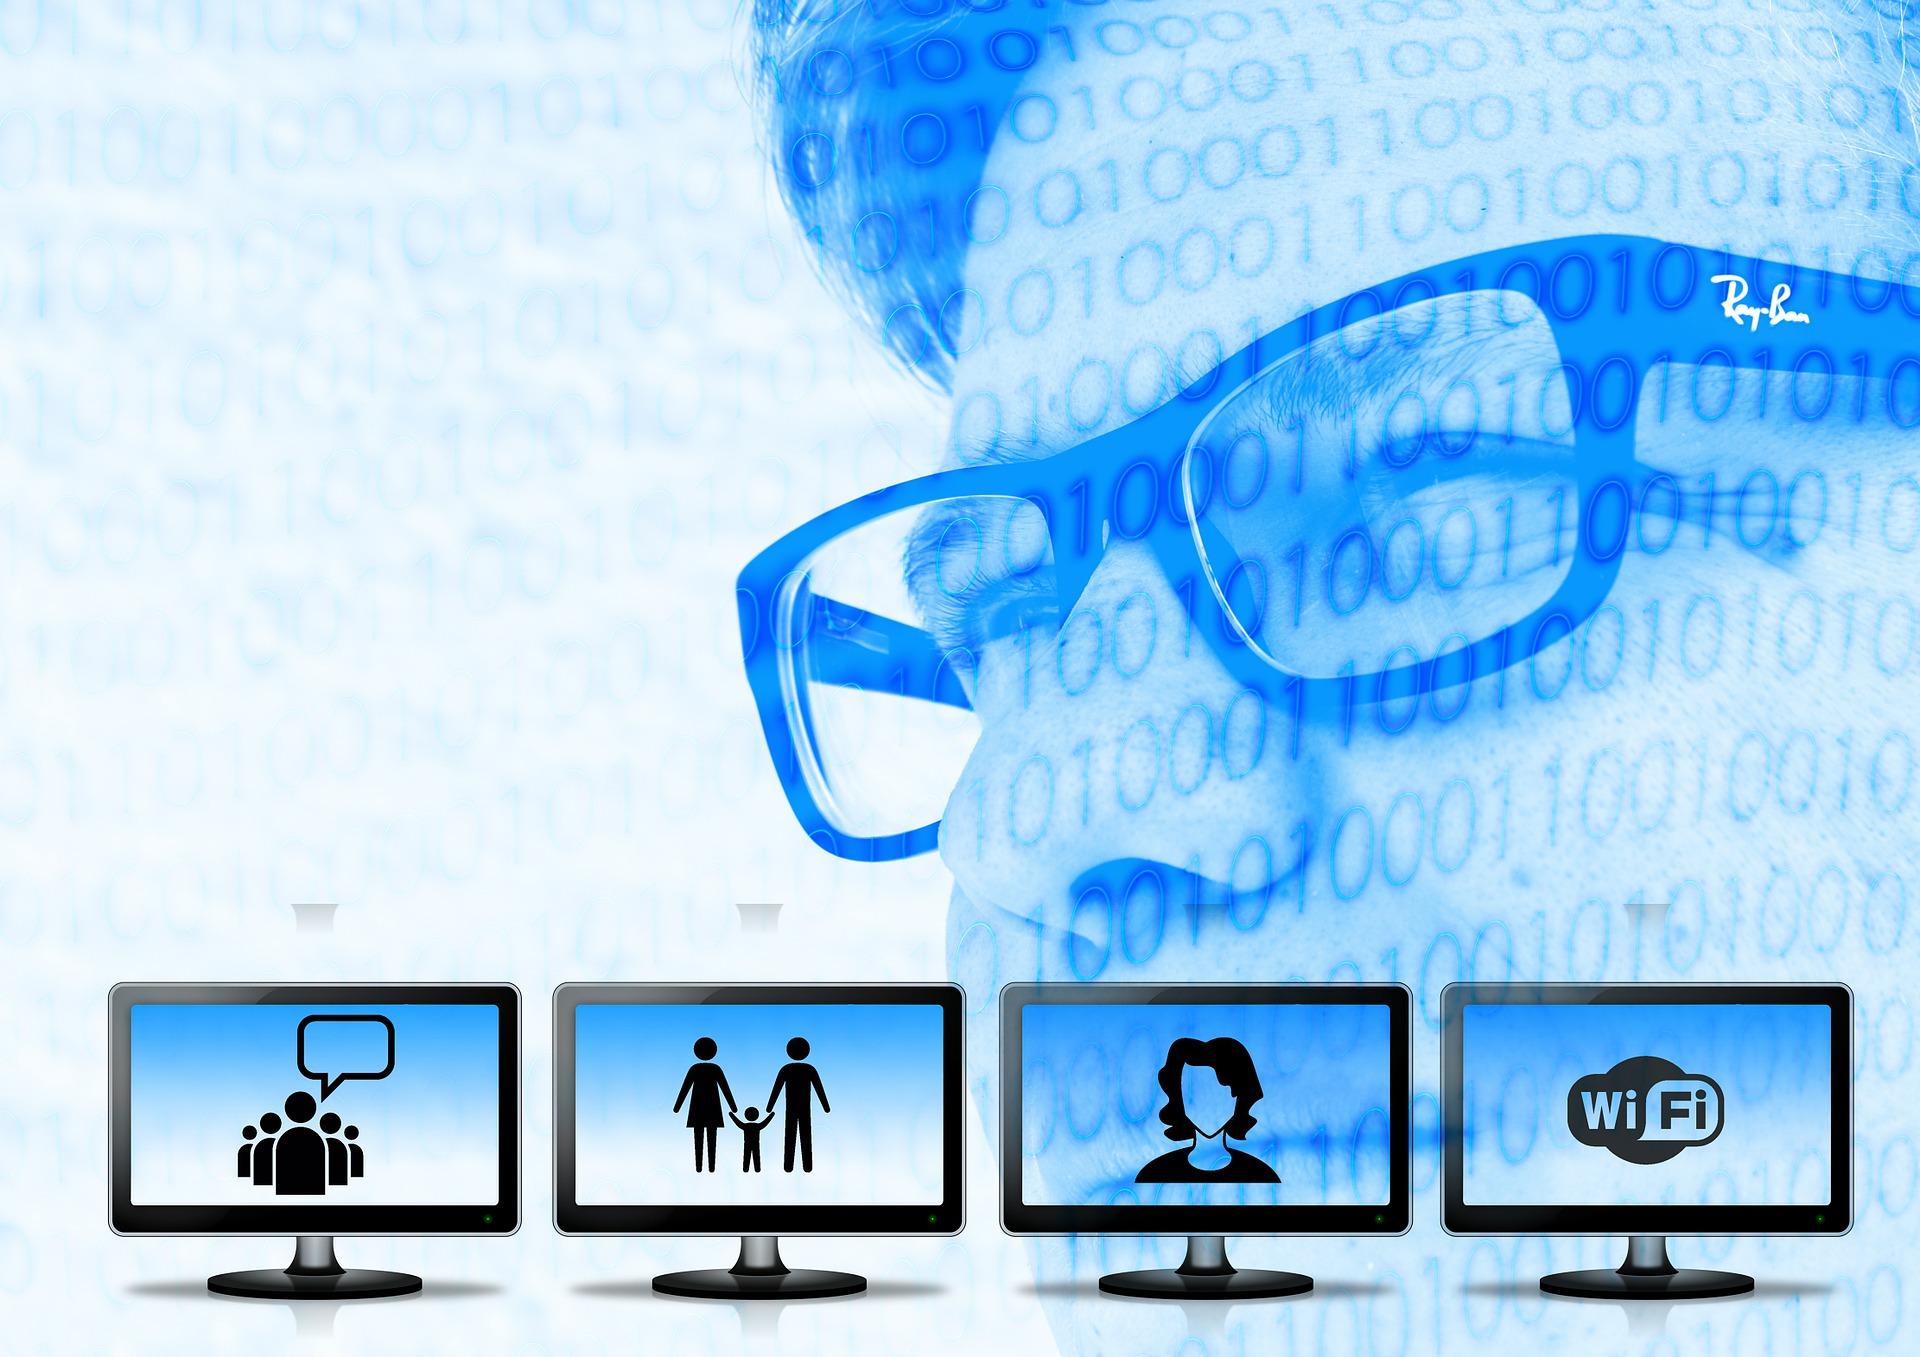 Xing oder Linkedin Profil erstellen - MKL Kreativ